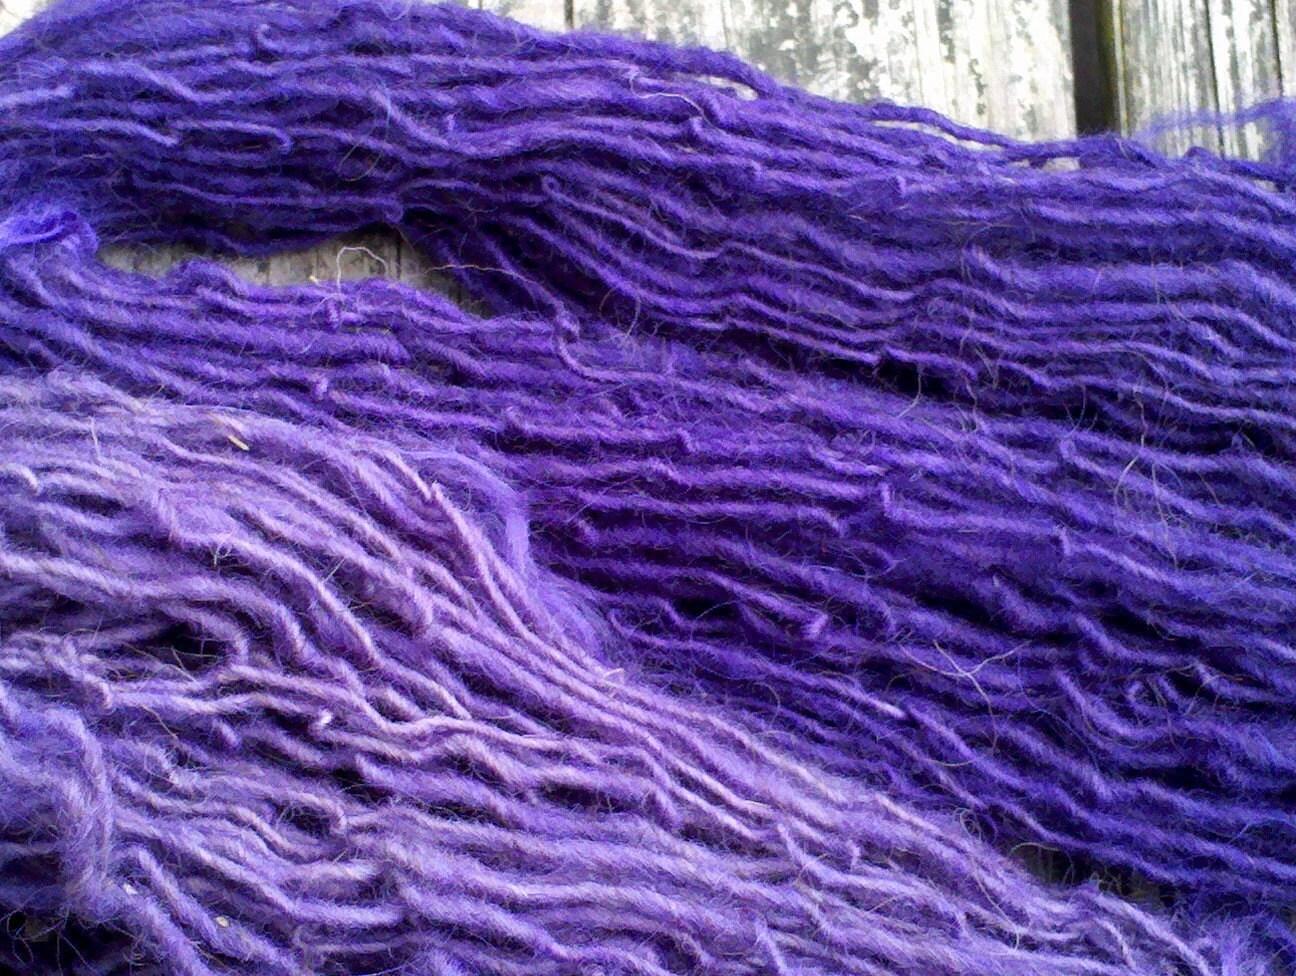 SWINGIN SINGLES Skein (tm) handspun Navajo Churro wool Purple 4.5 oz